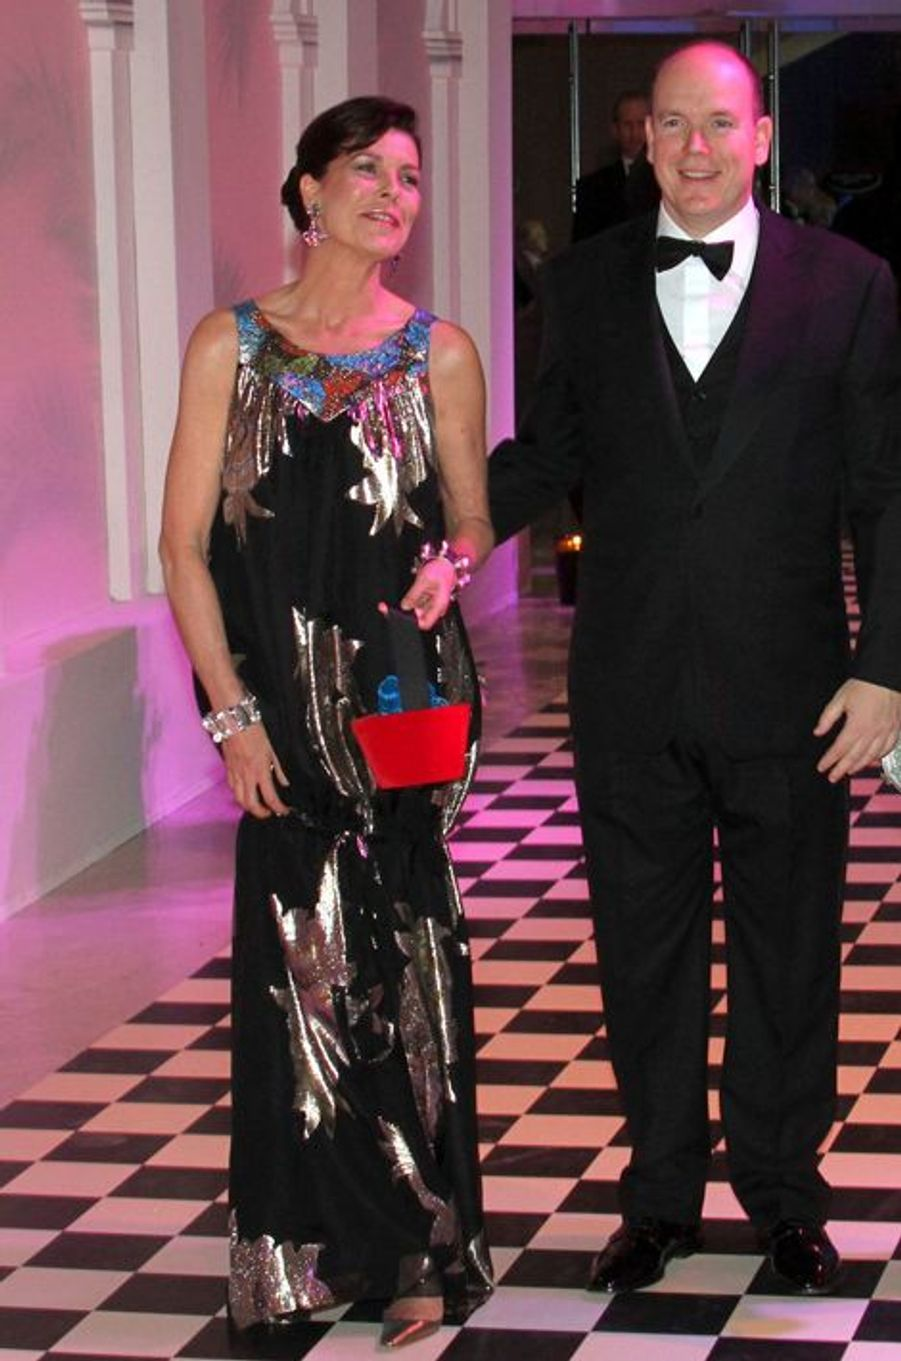 La princesse Caroline de Monaco au bal de la Rose 2010, avec le prince Albert II